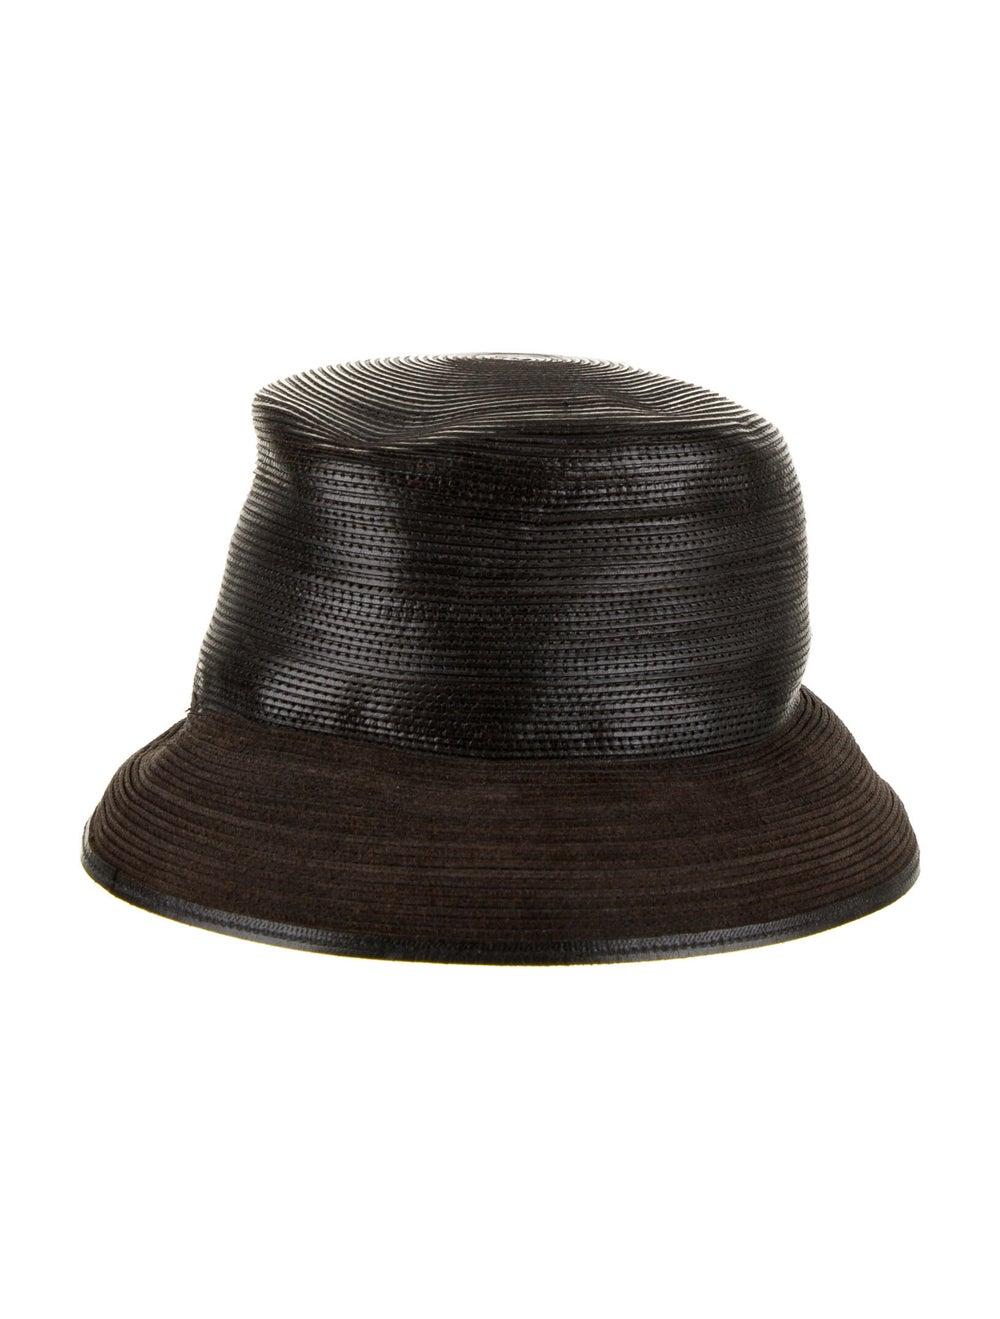 Patricia Underwood Leather Brim Hat Brown - image 2